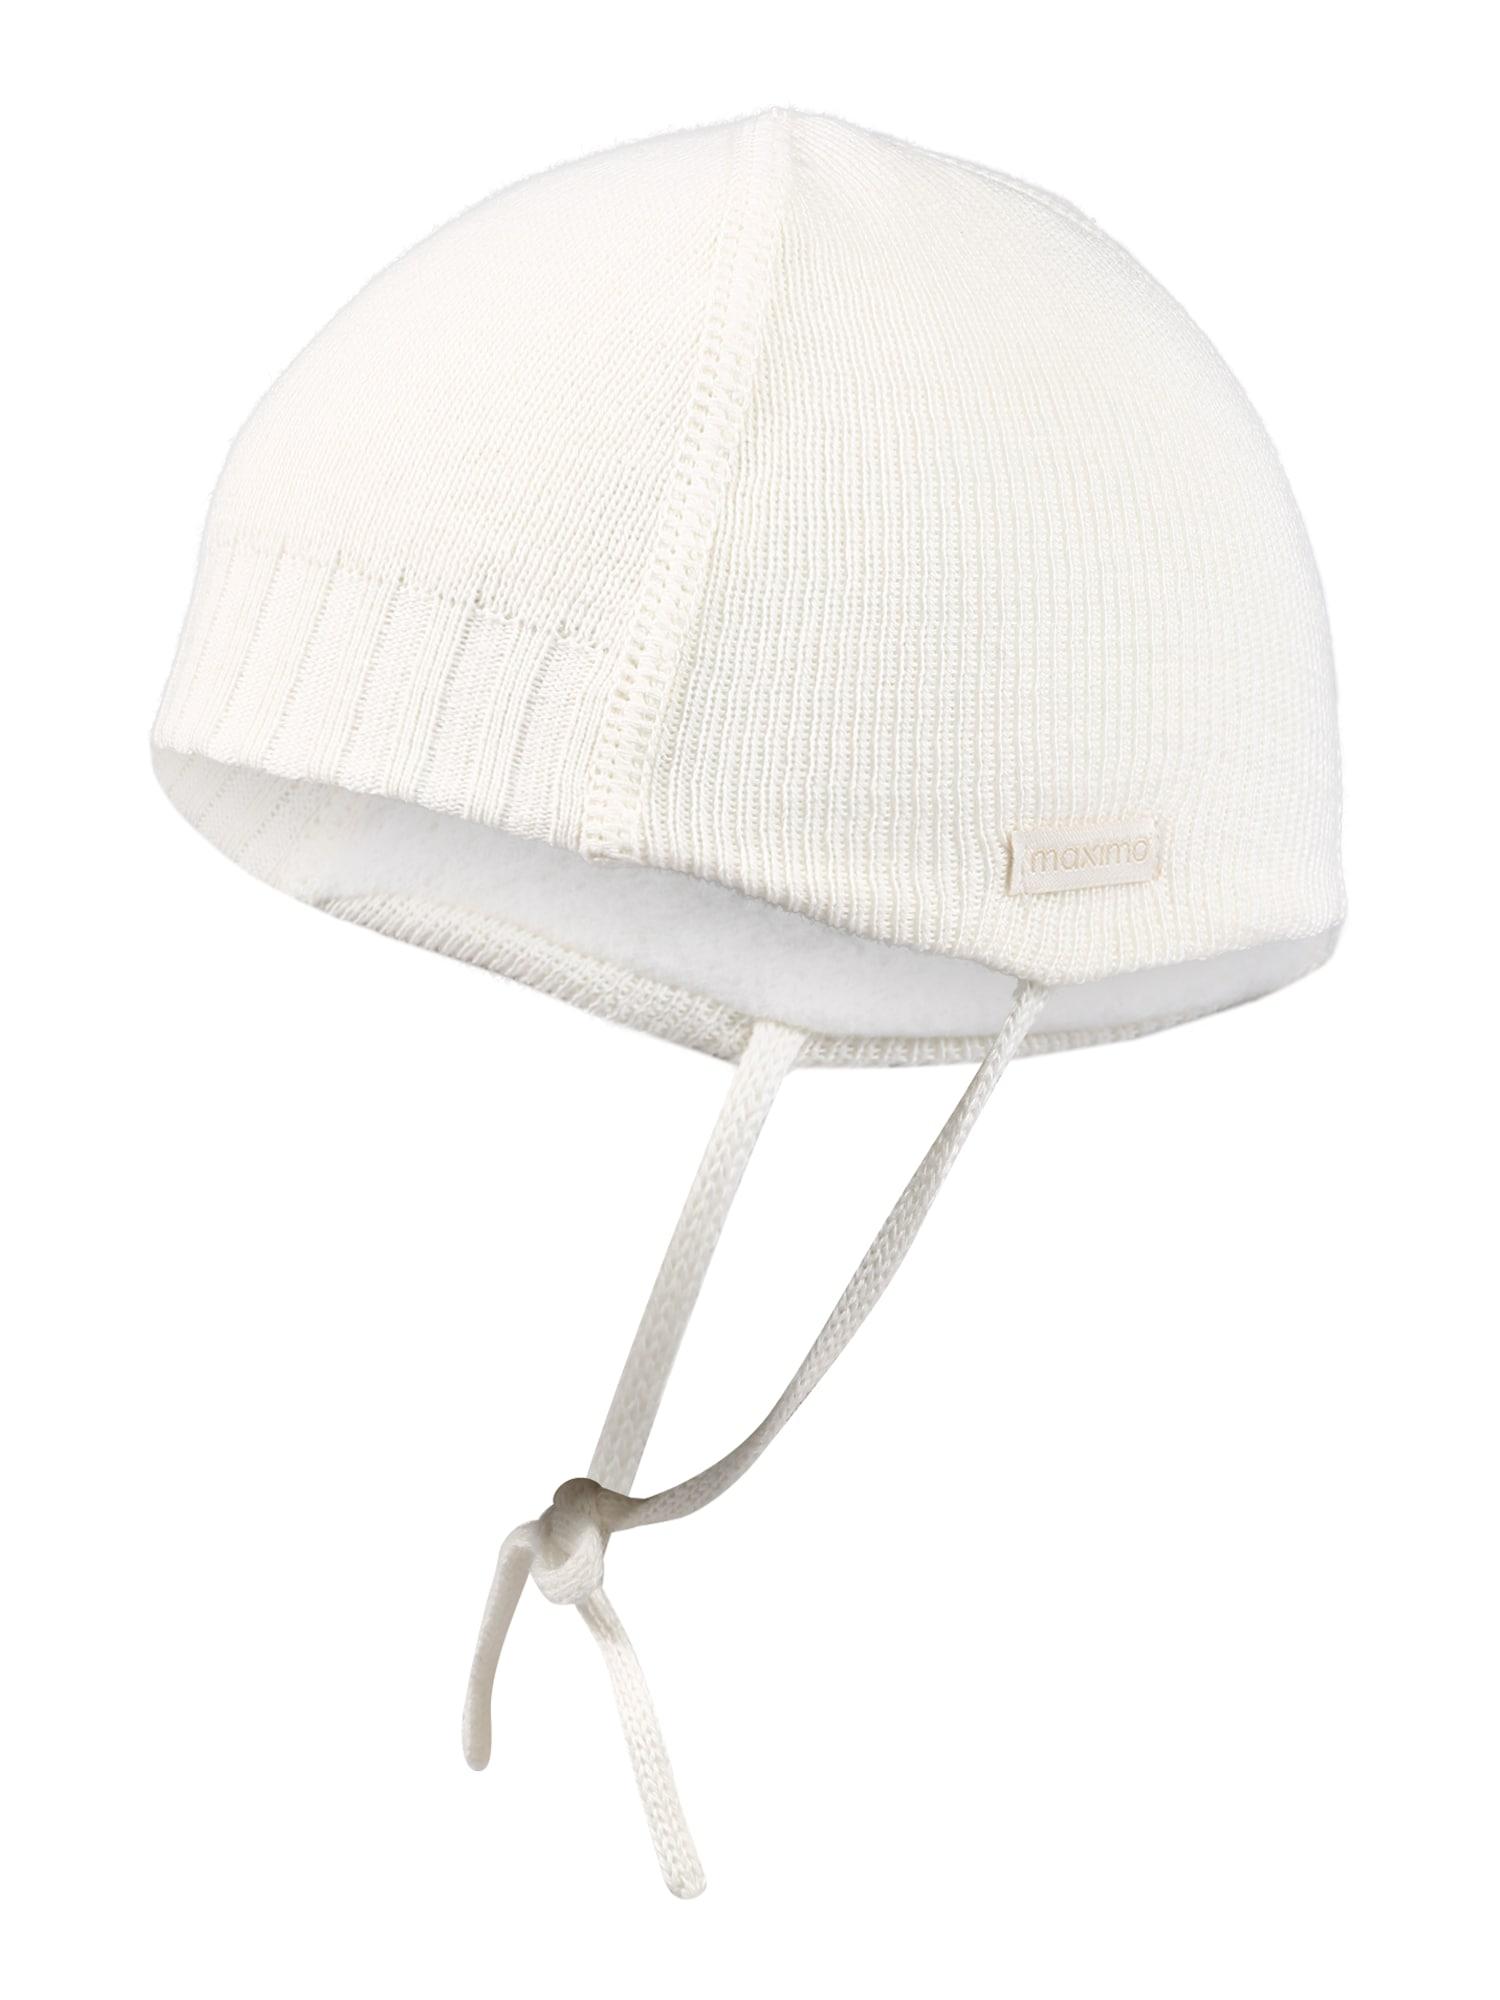 MAXIMO Megzta kepurė 'Sunni' vilnos balta